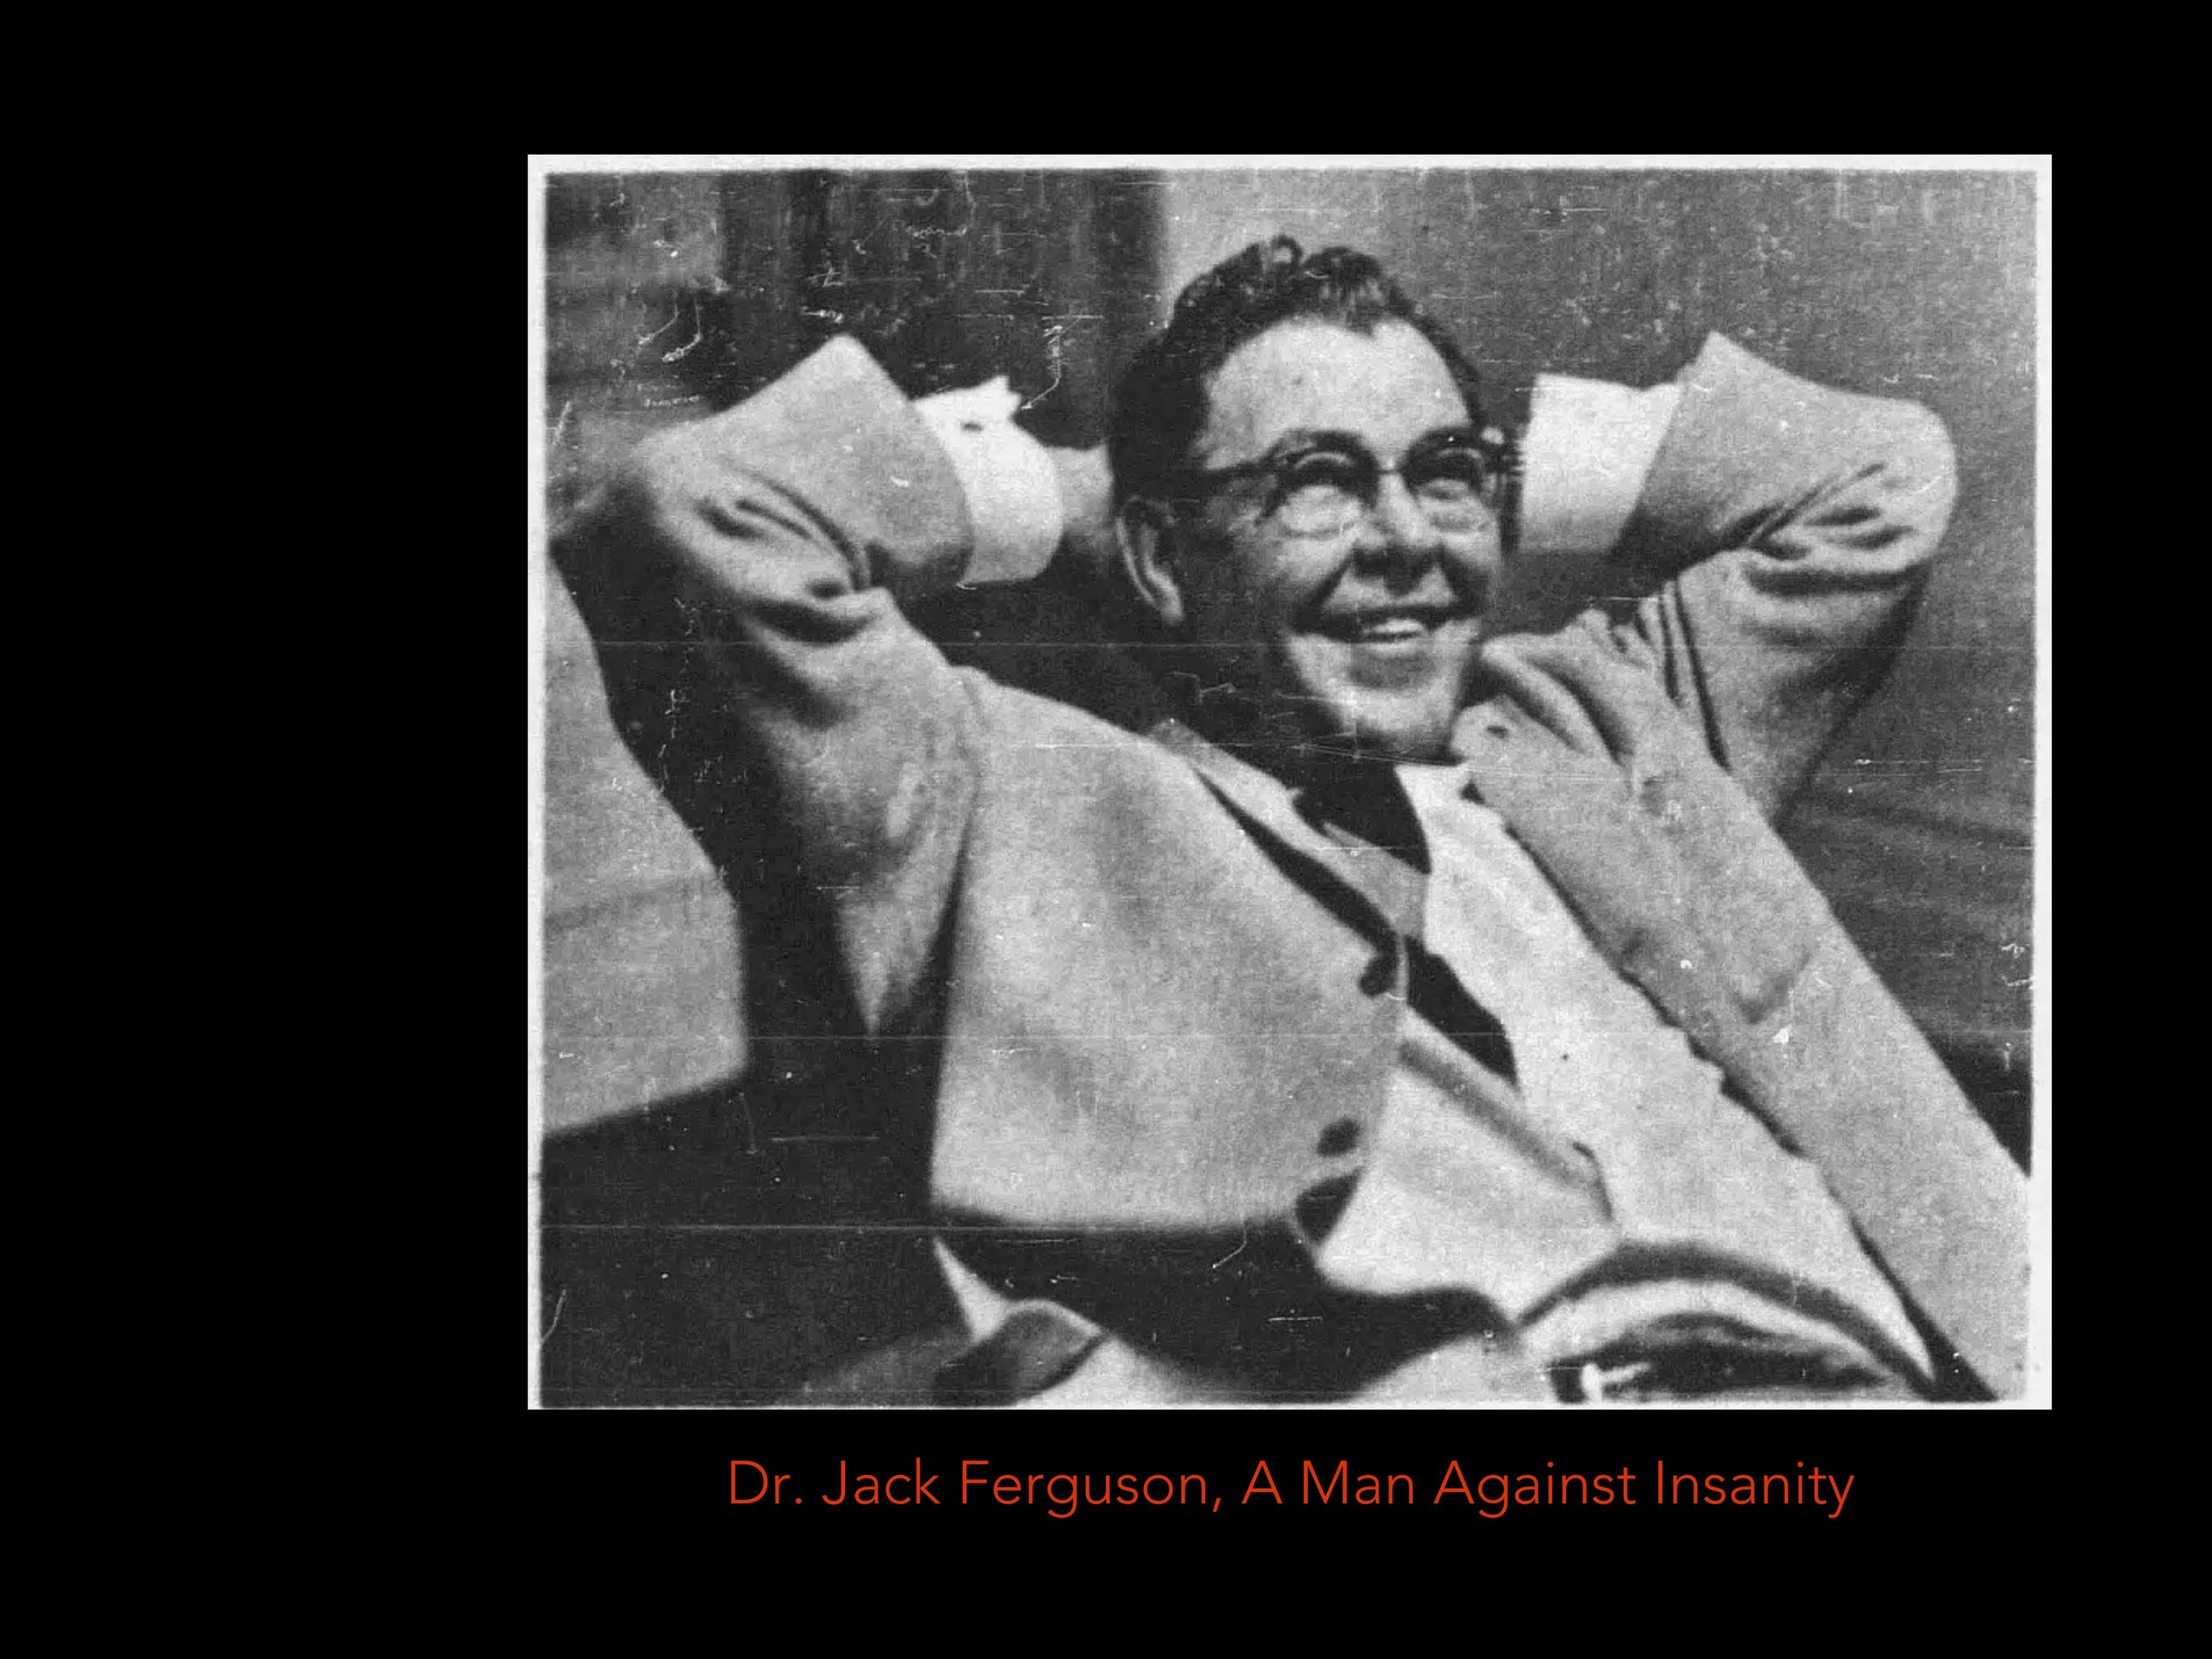 A Man Against Insanity_36.jpg